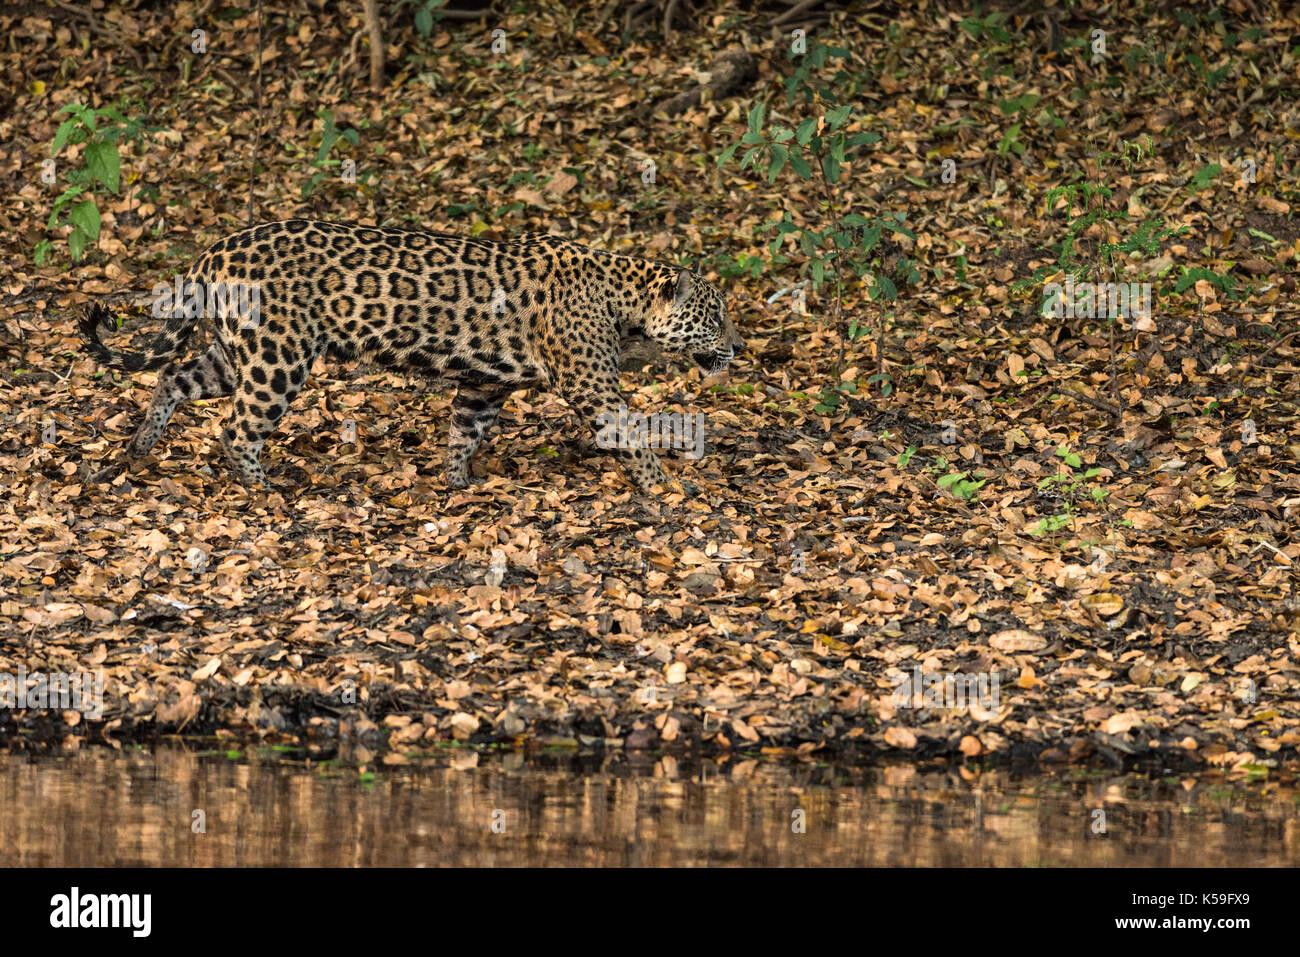 Jaguar camouflage